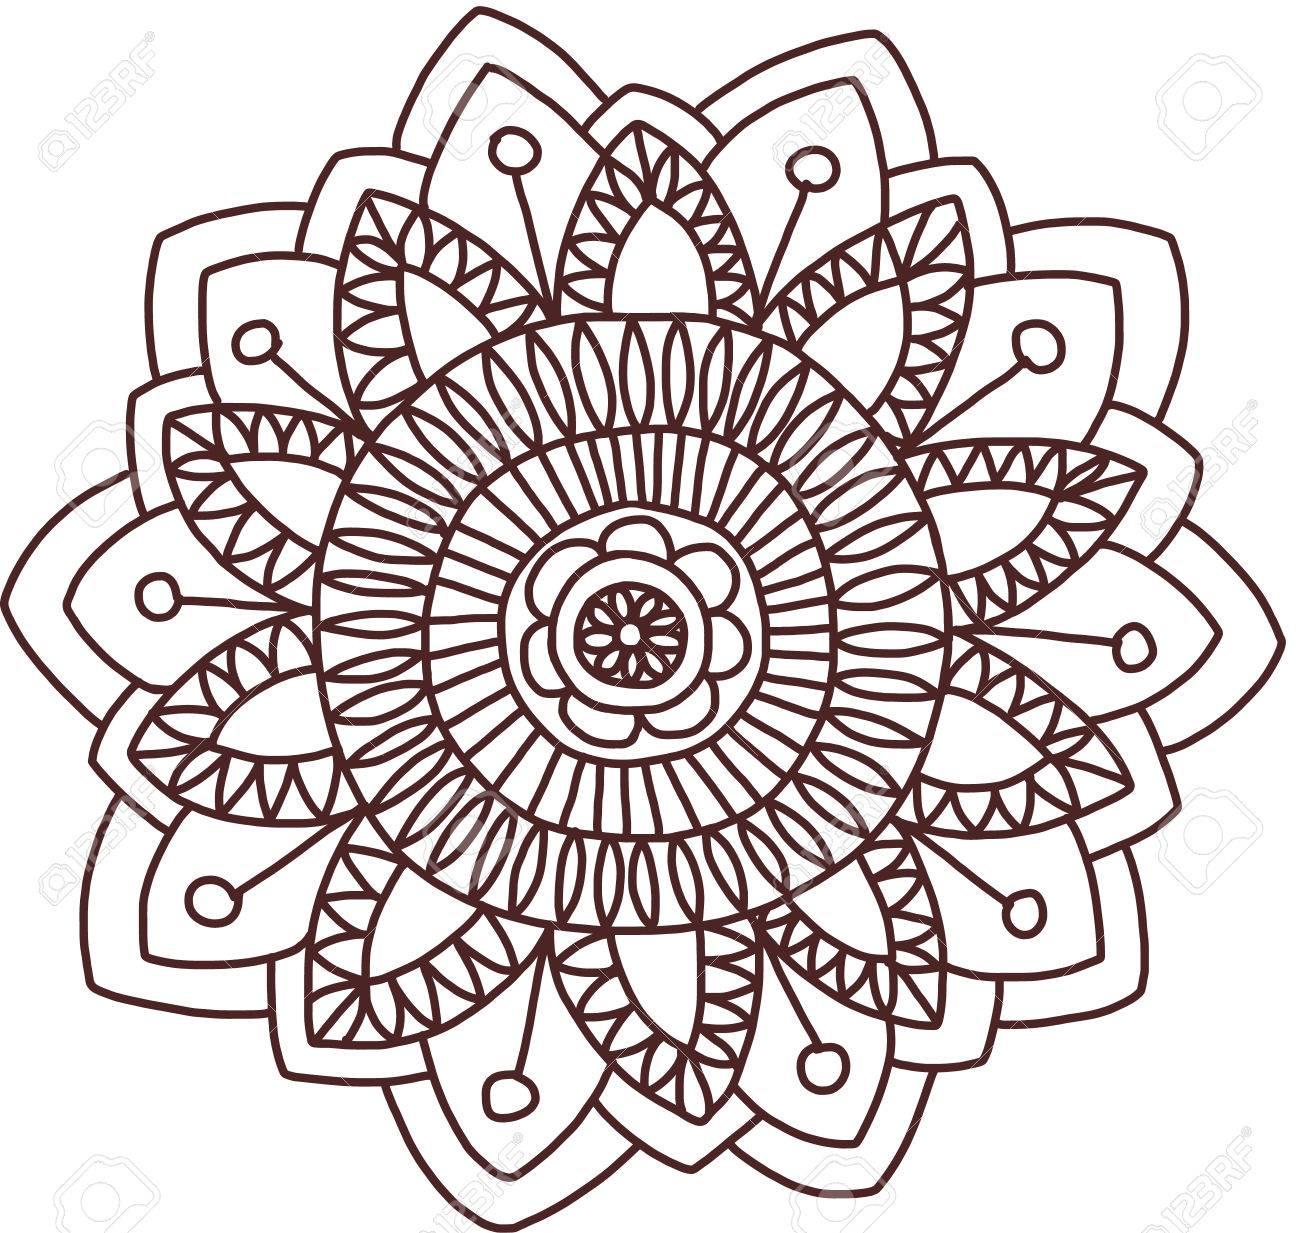 vector ethnic mehndi pattern template for mehndi ornament hand